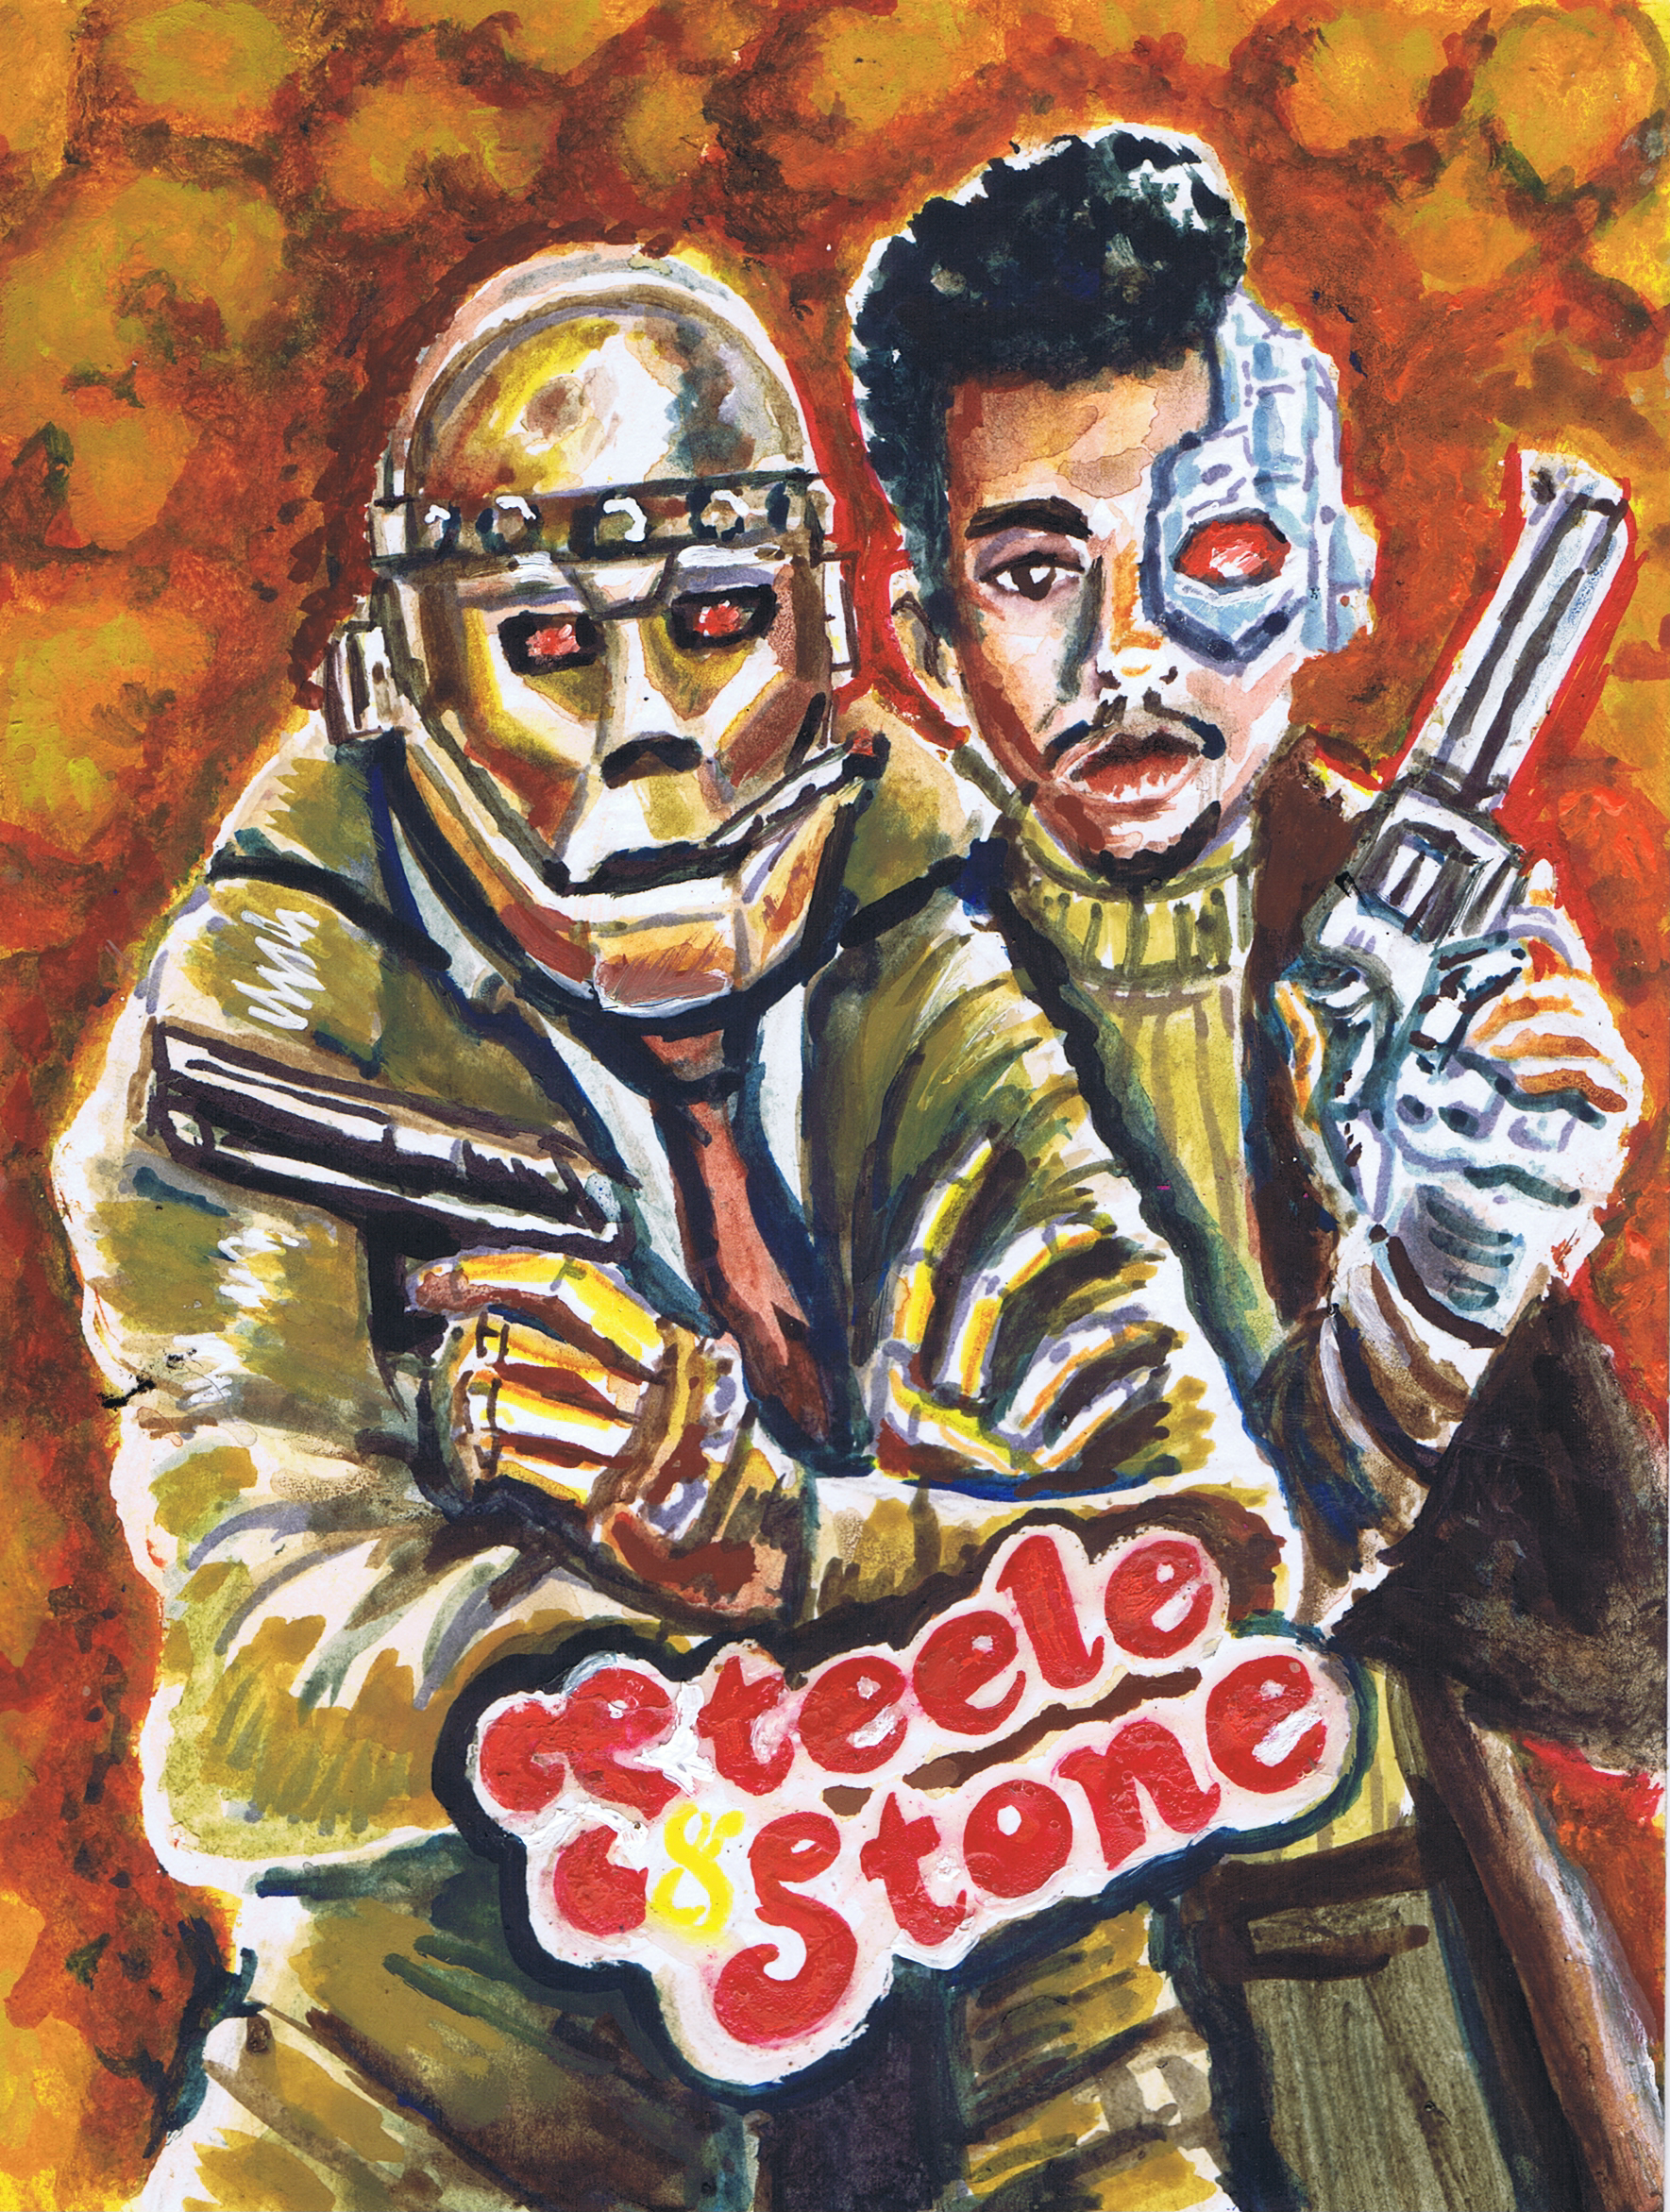 Steele and Stone